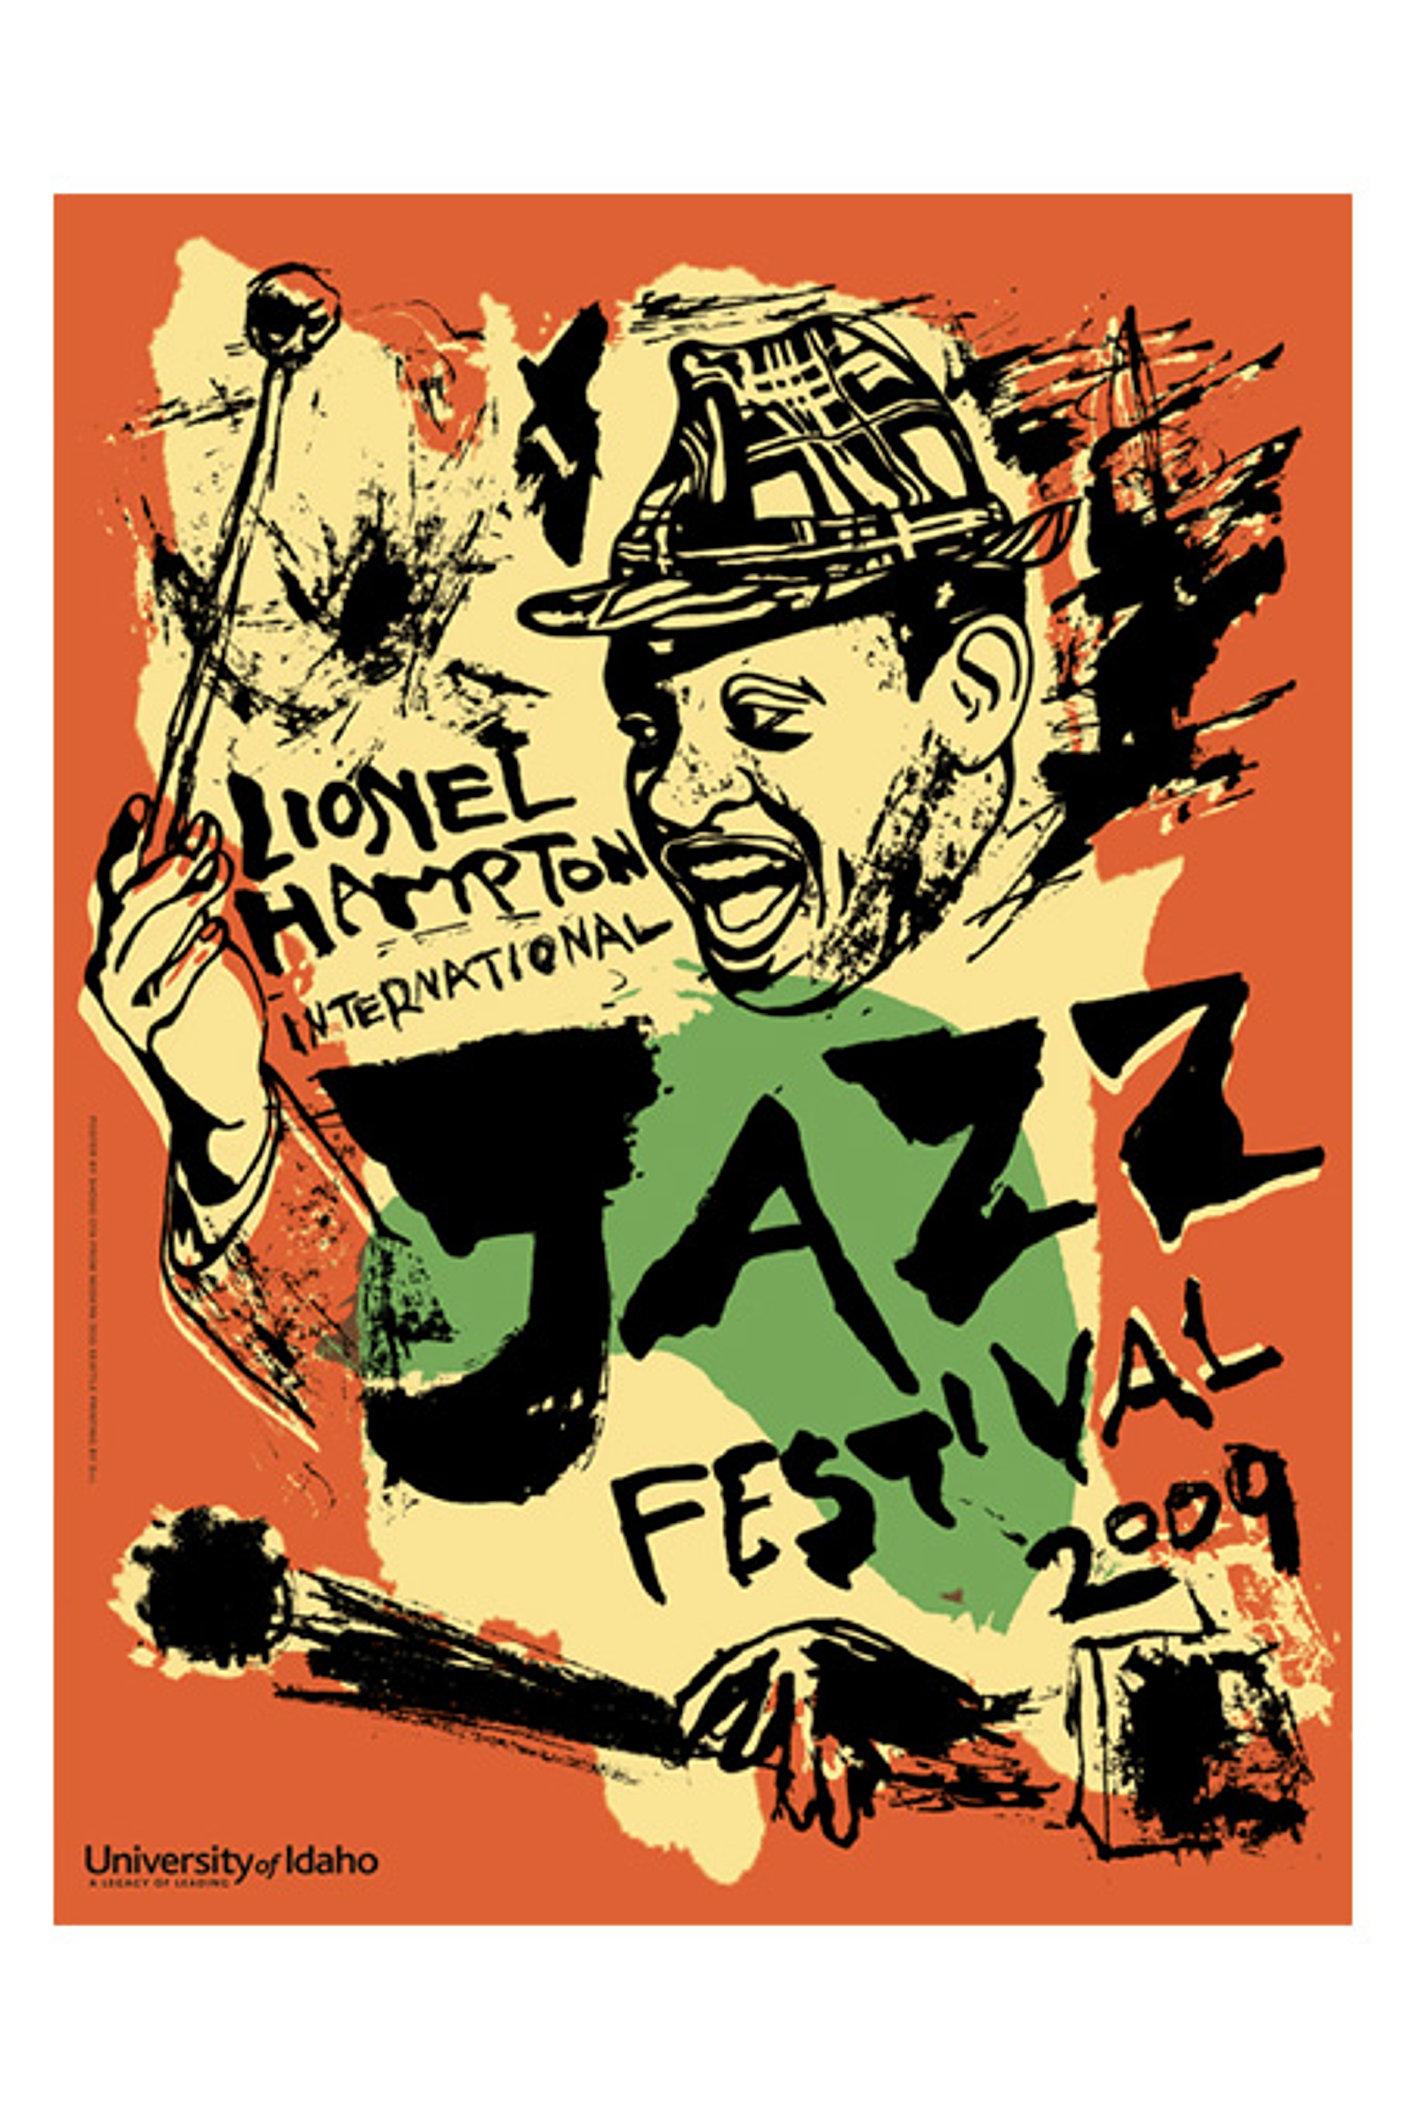 Lionel Hampton Jazz Festival 2009